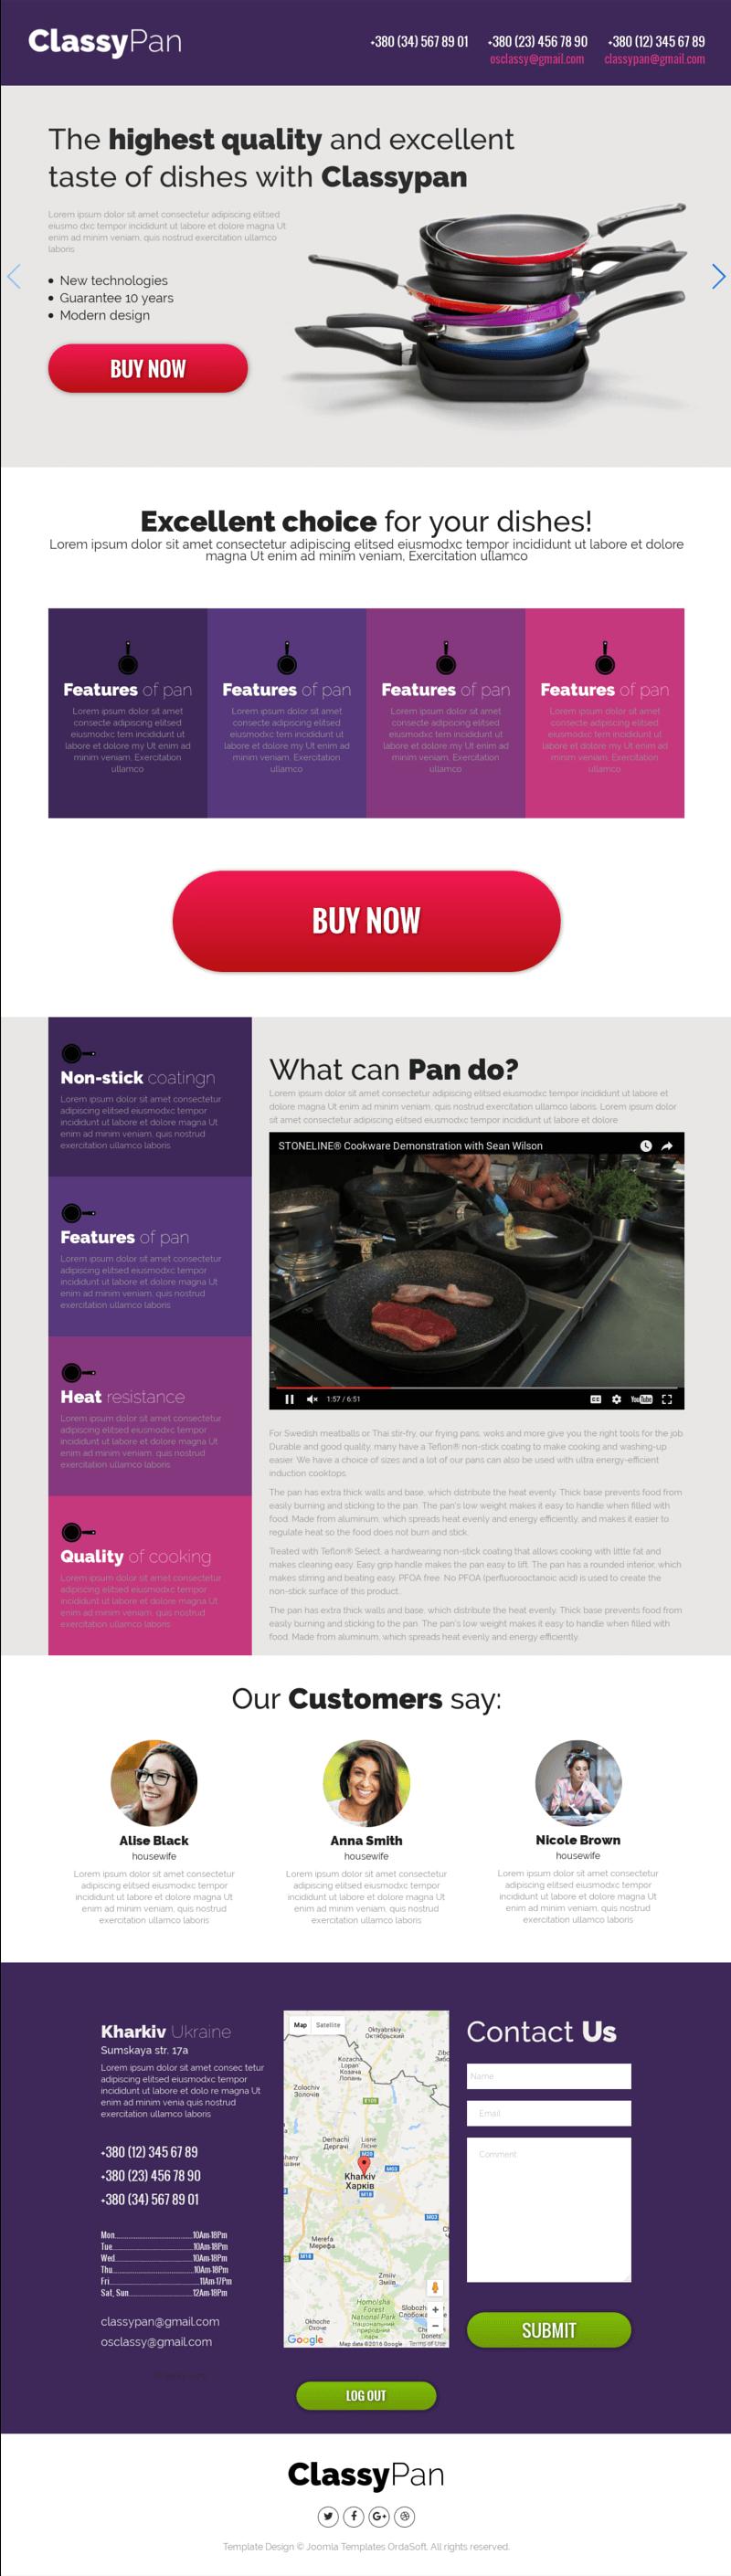 Classy Pan Joomla Landing Page Template - Joomla landing page template